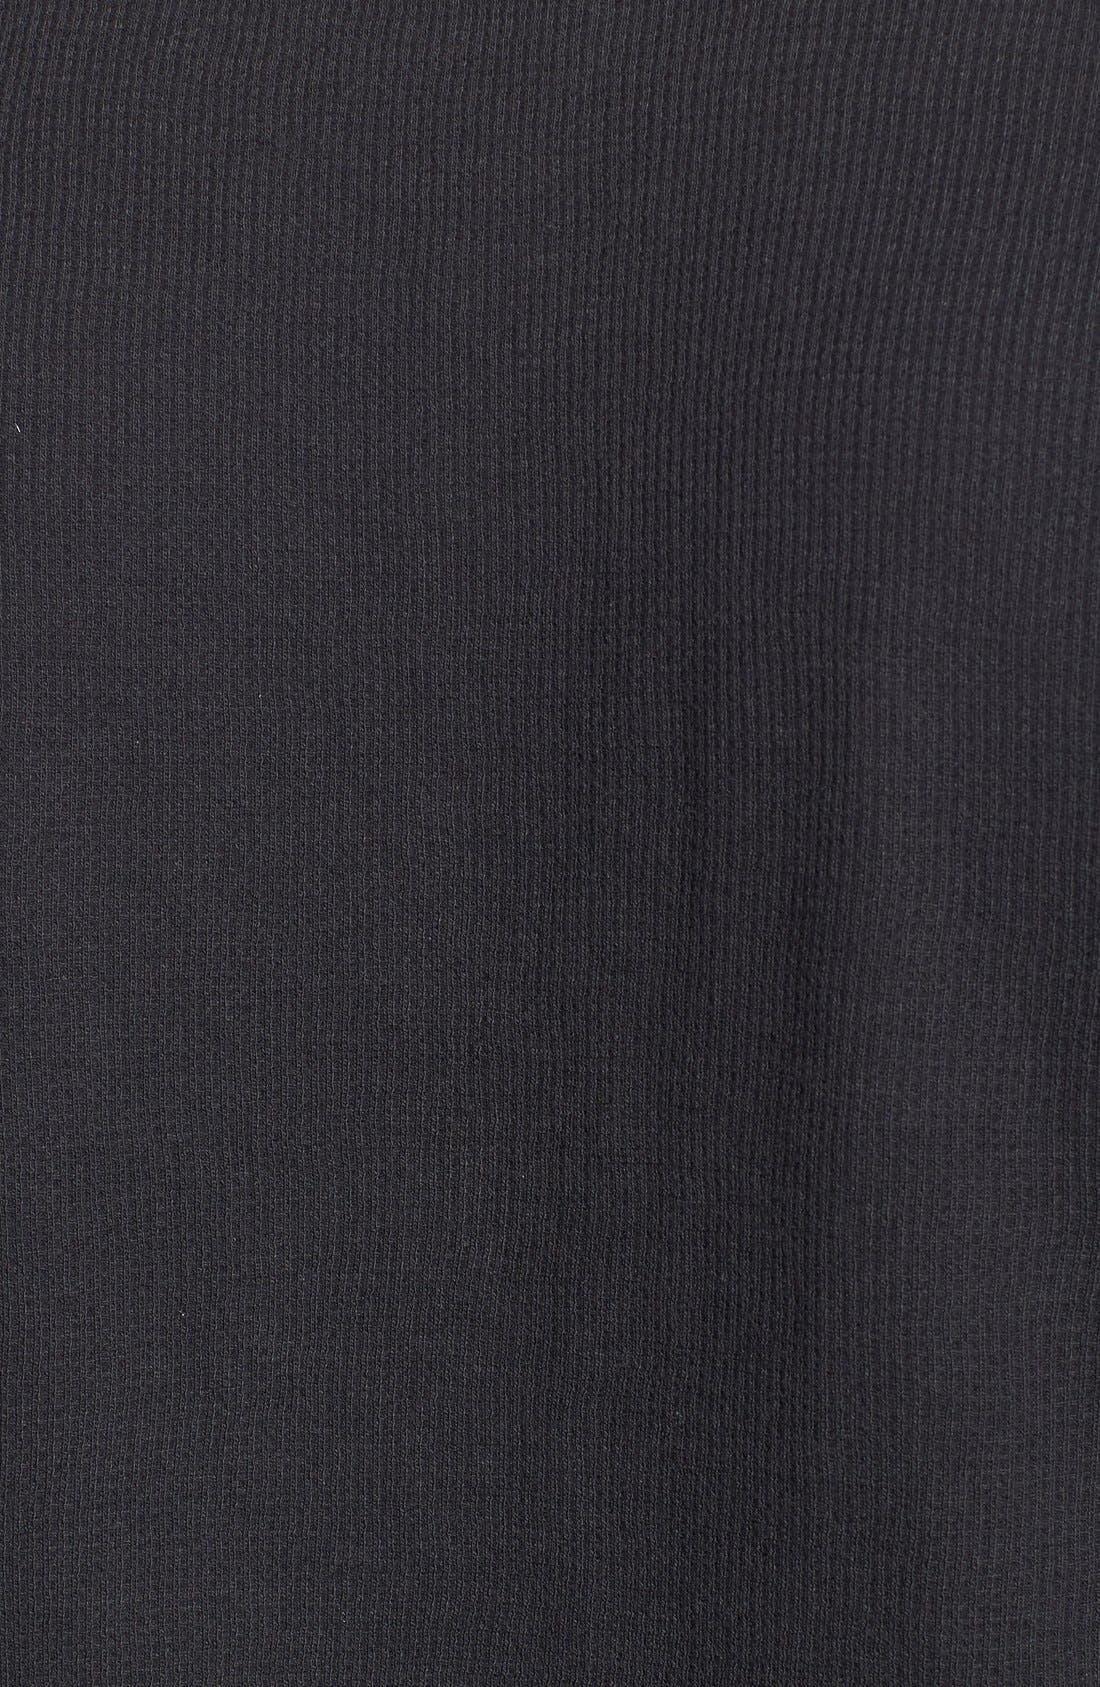 Alternate Image 5  - Nordstrom Men's Shop Waffle Knit Long Sleeve T-Shirt